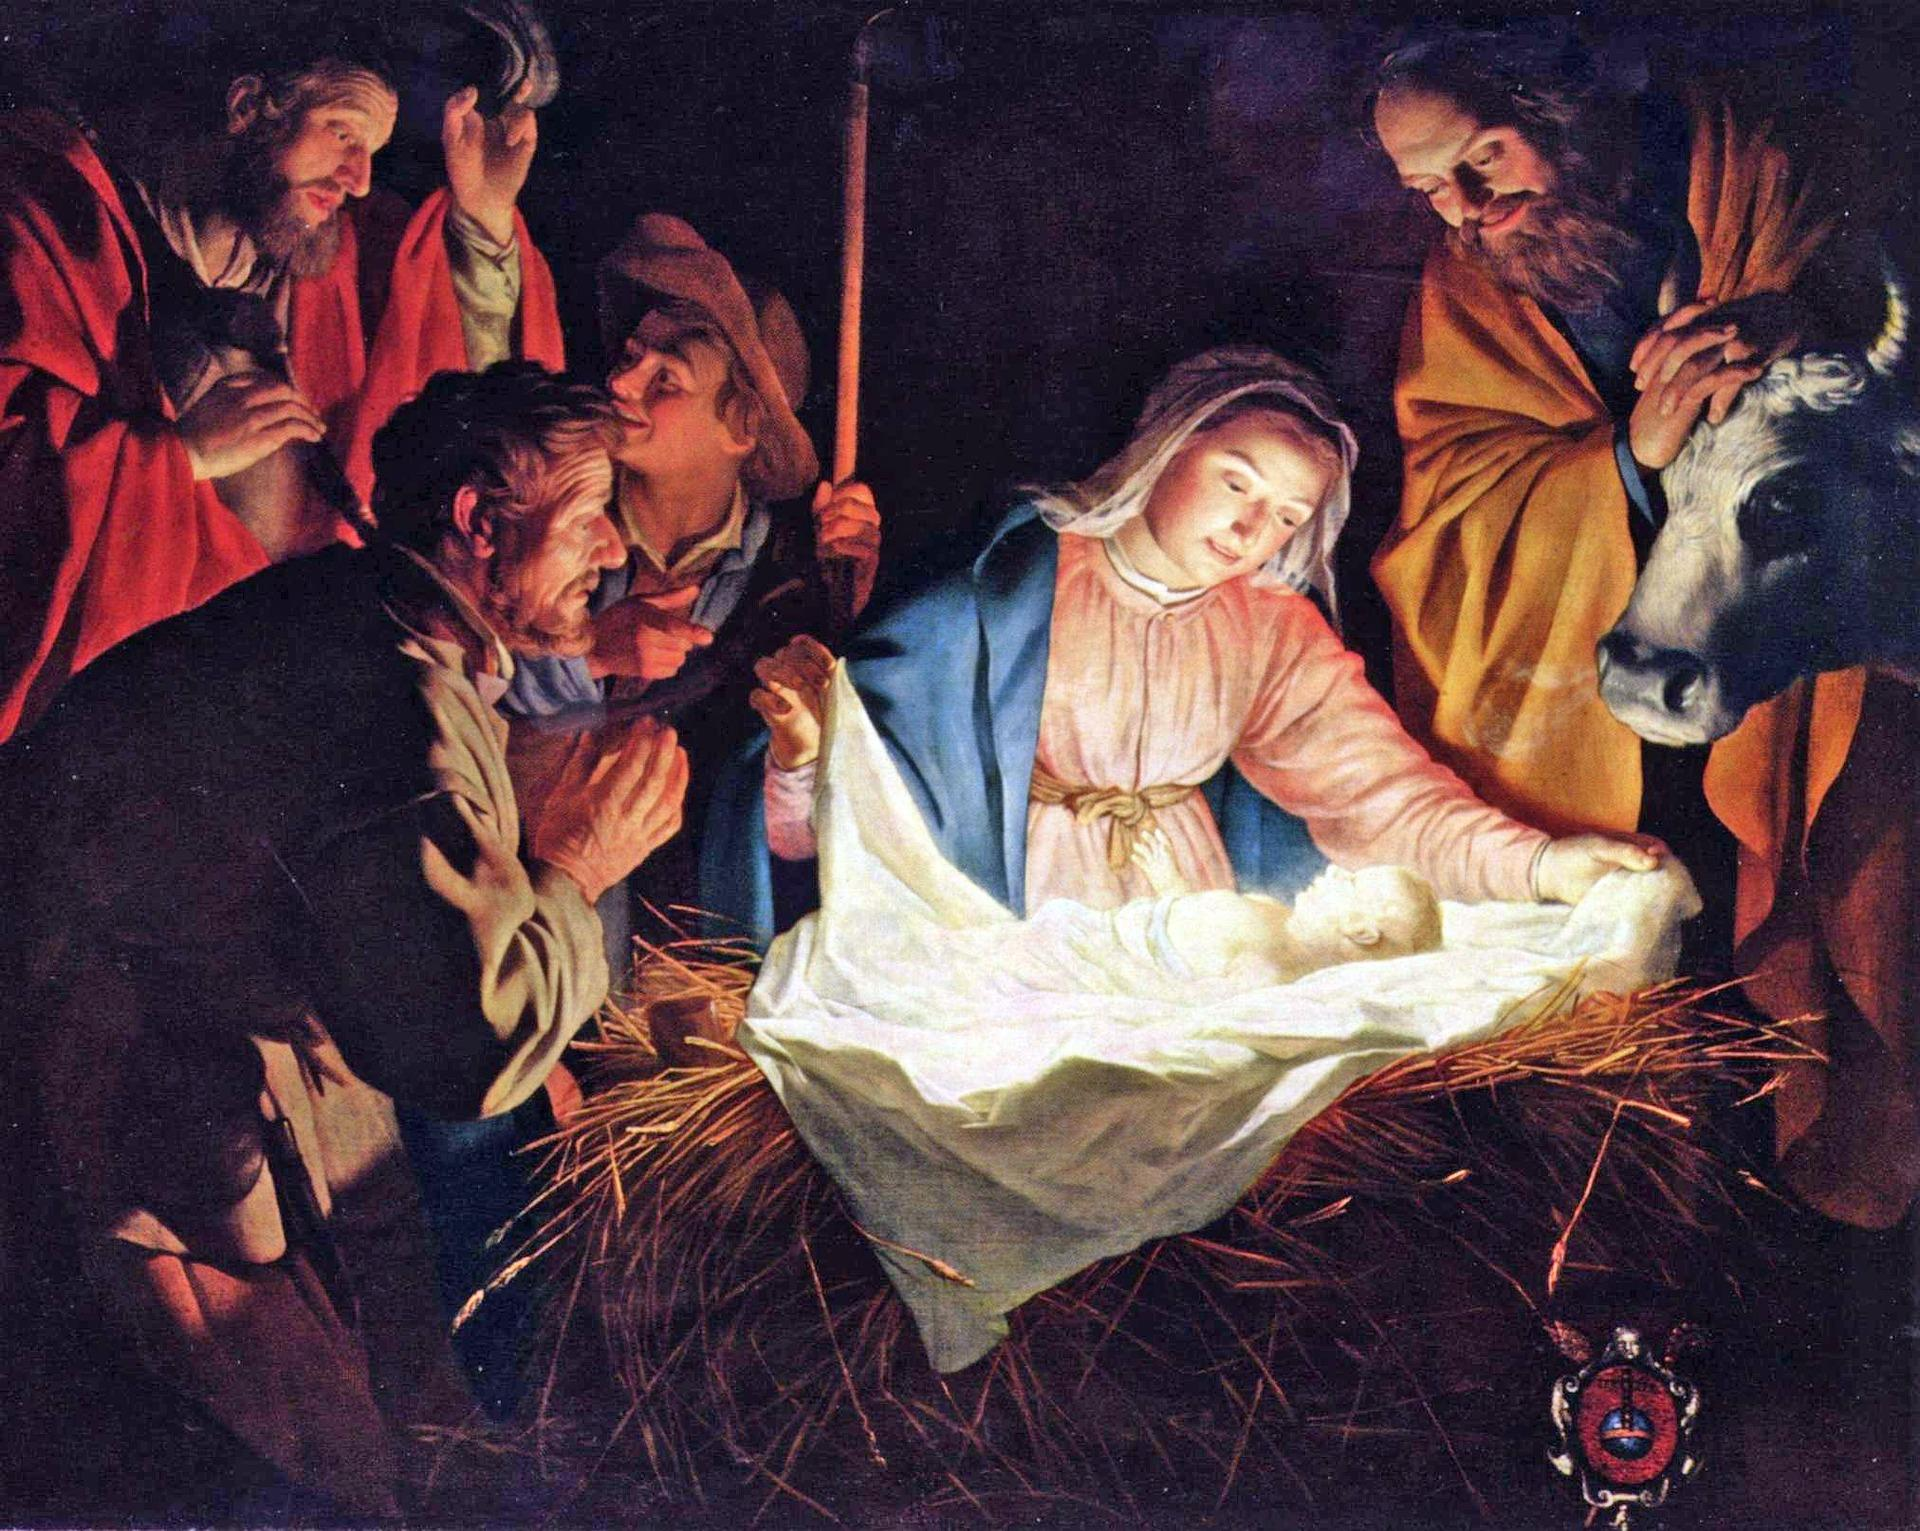 birth of jesus 1150128 1920 - LÁSKA, definice lásky, druhy lásky